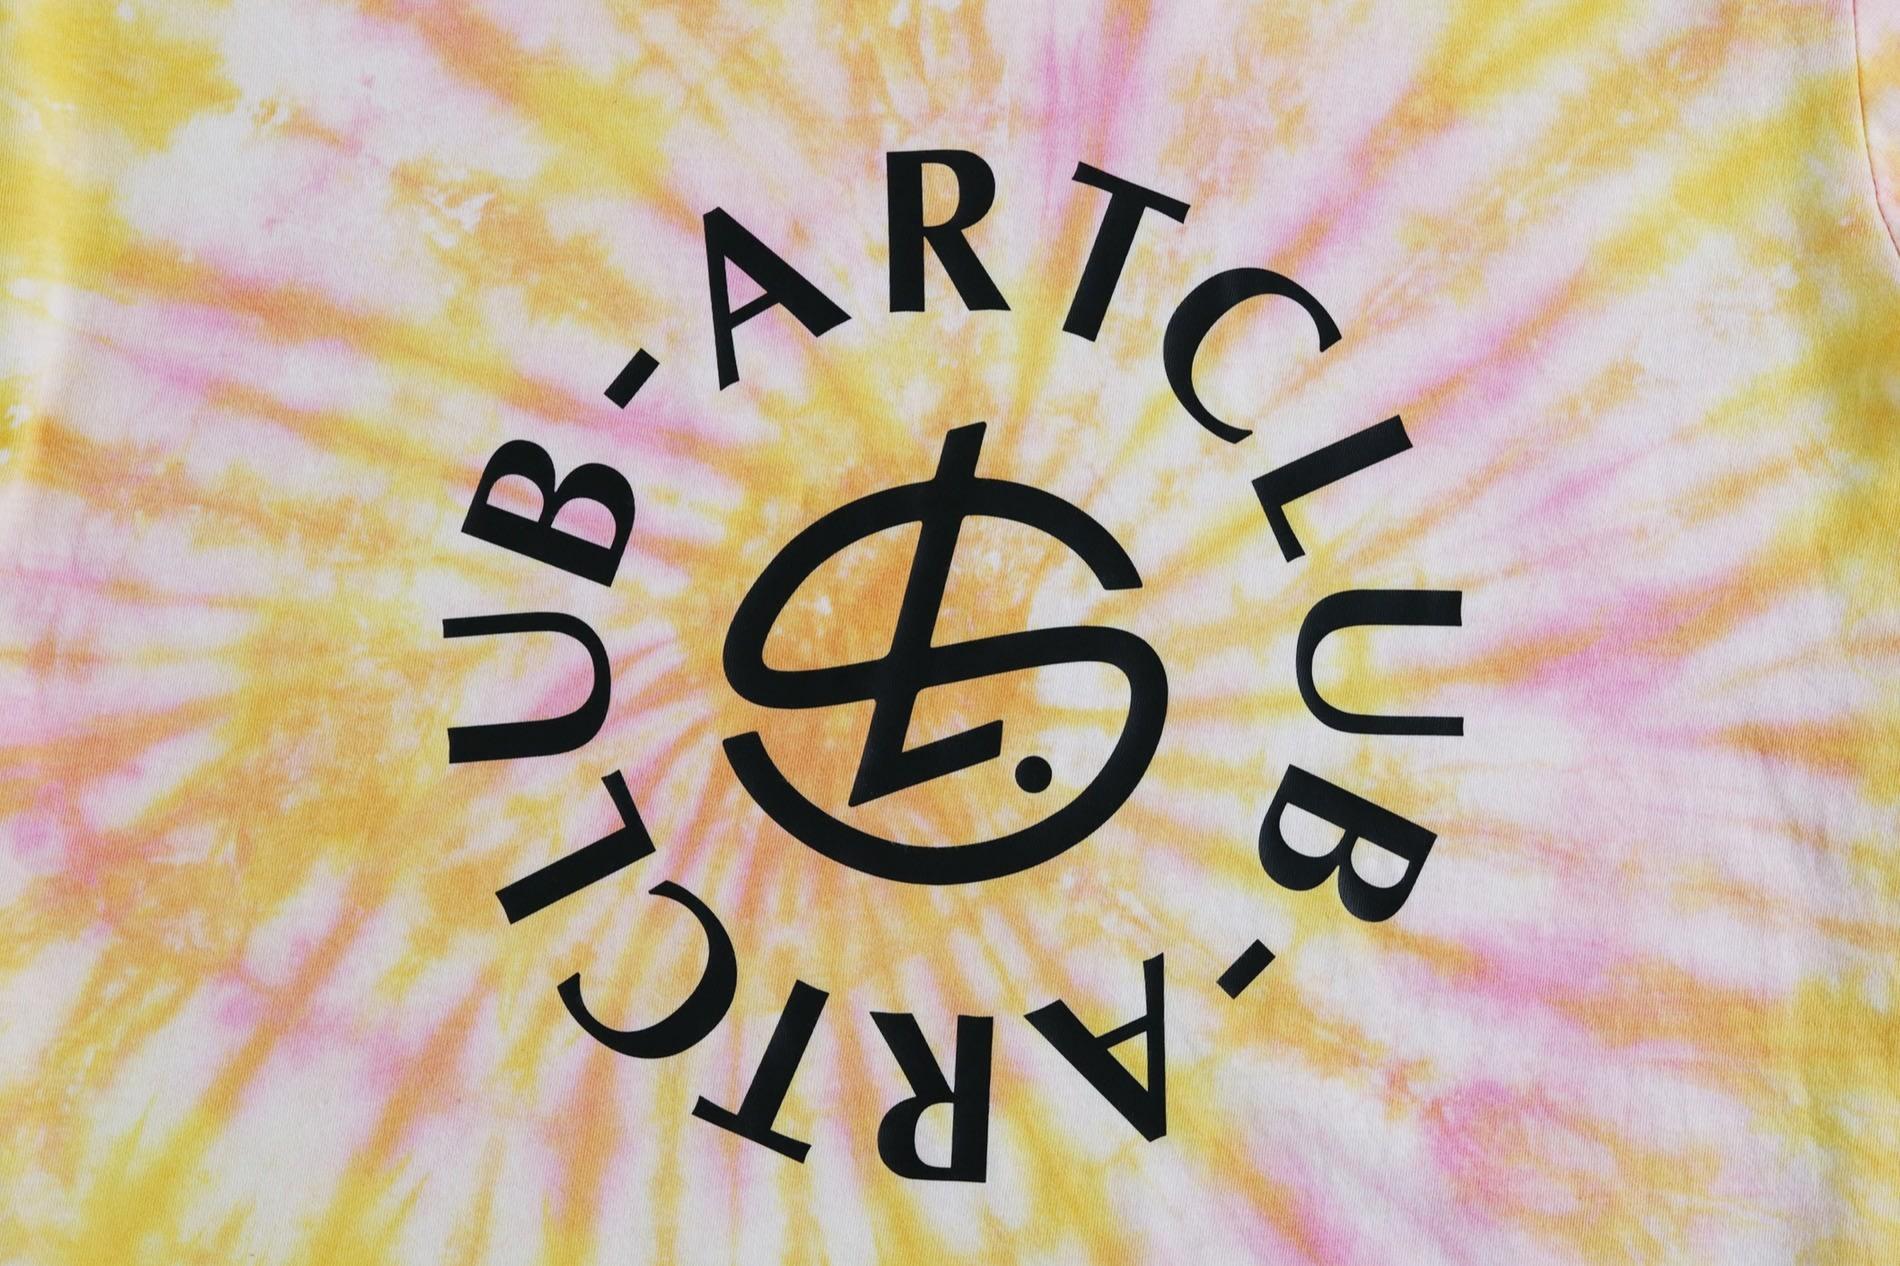 Shelflife x Artclub and Friends Tie-Dye Tee - default